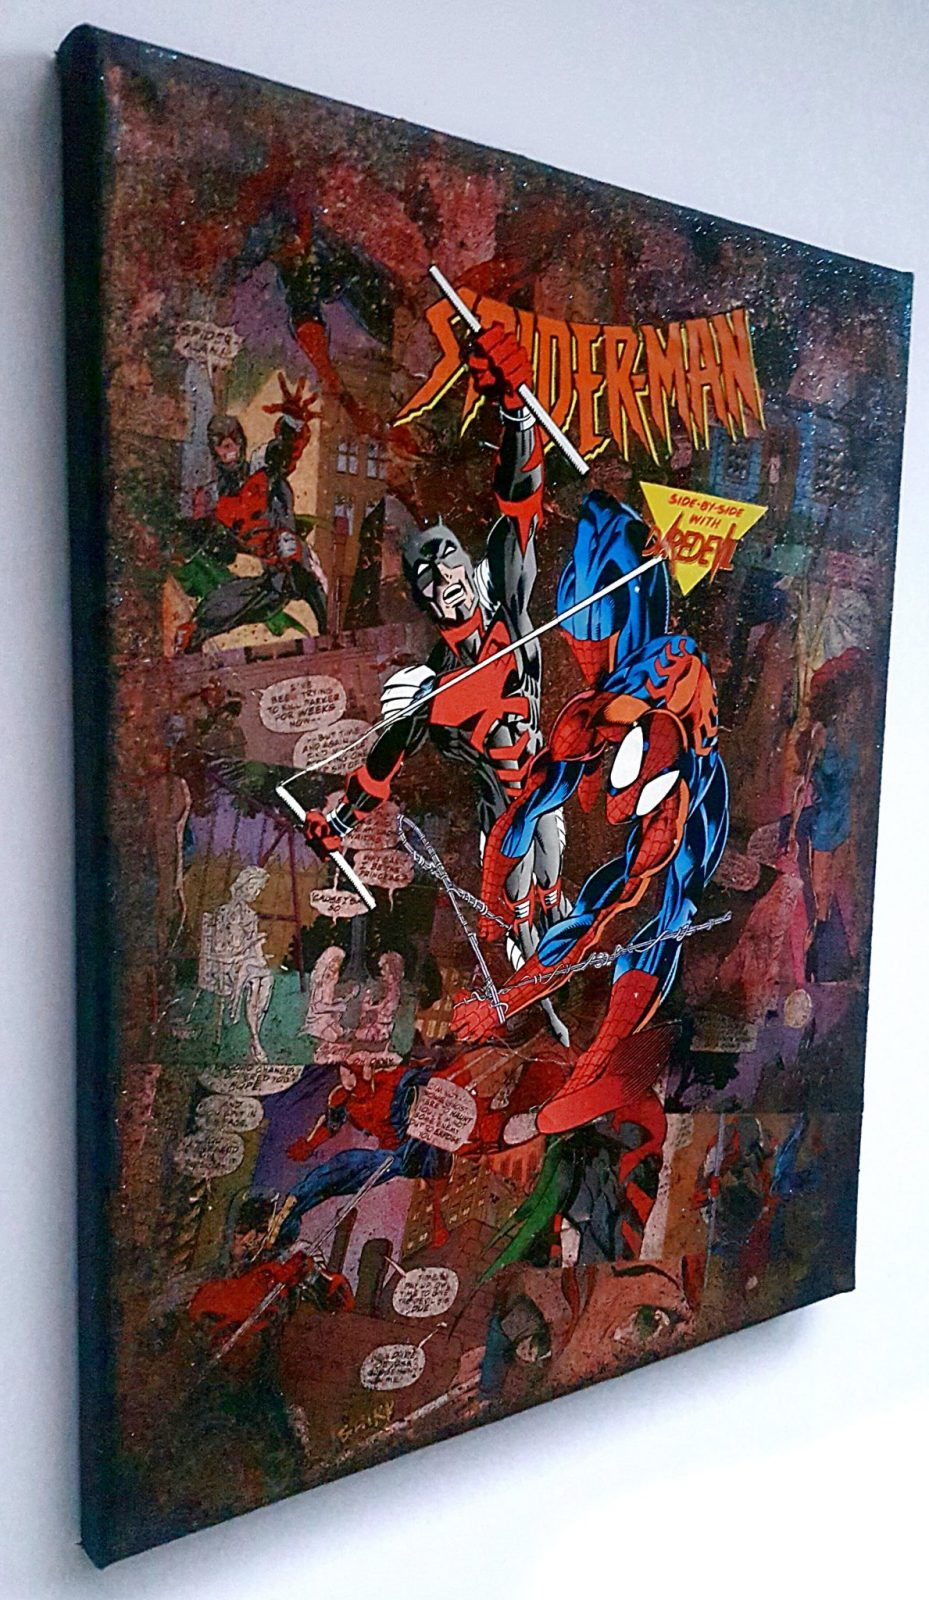 Spiderman daredevil team up premium marvel graphic canvas the avengers iron man wall art - Marvel comics decor ...